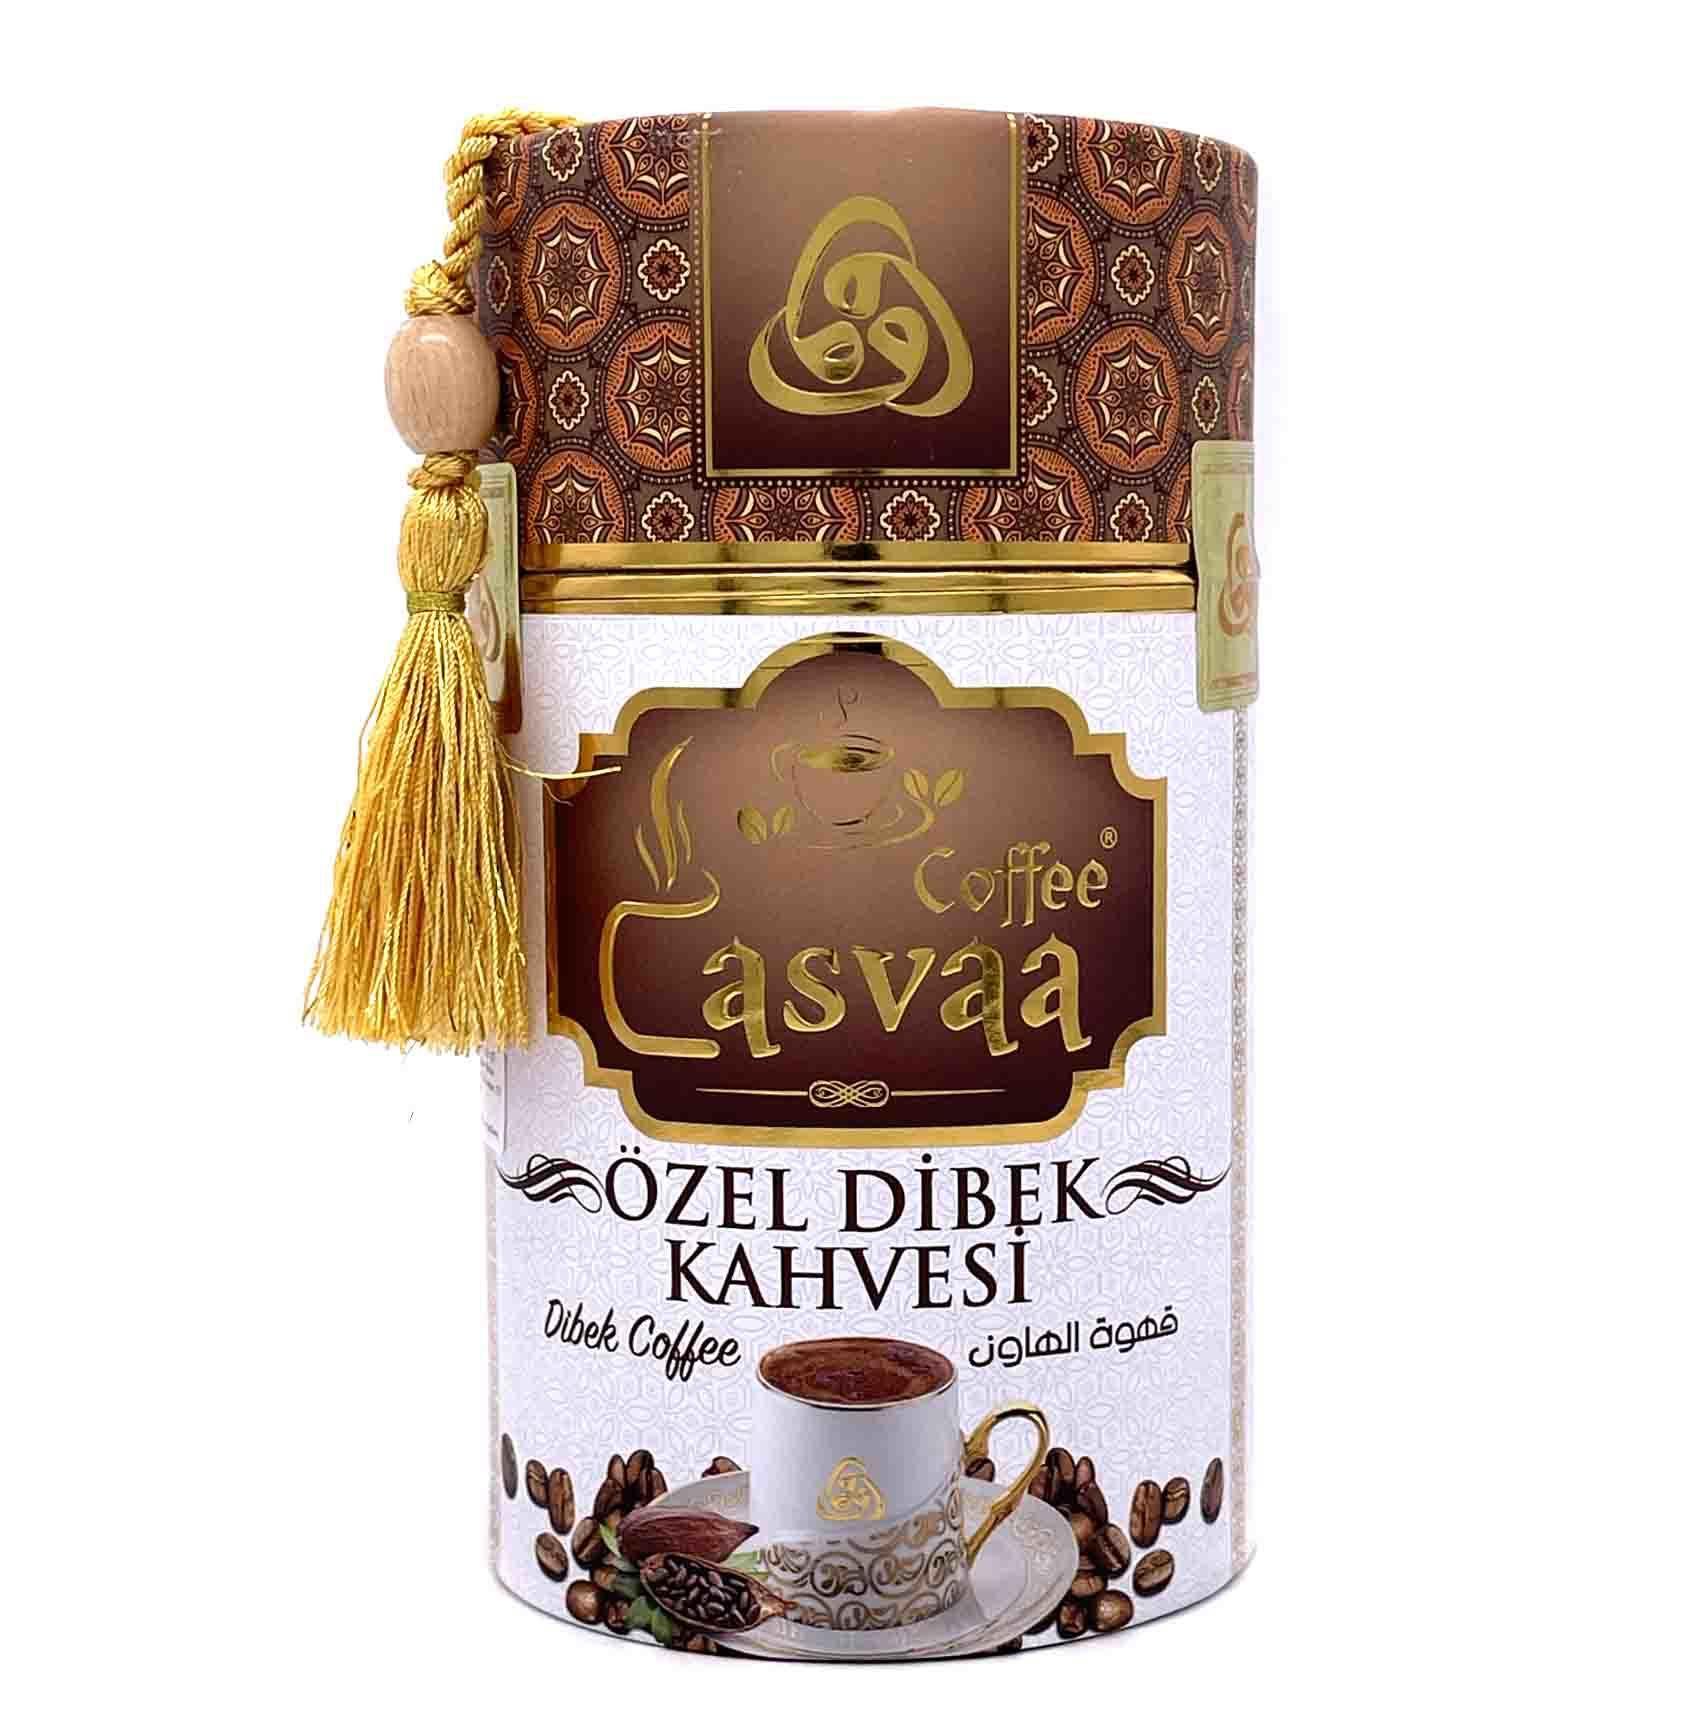 Кофе молотый Турецкий кофе молотый с кардамоном, Casvaa, 250 г import_files_5a_5a55f9ab564711eba9df484d7ecee297_022e0d895faf11eba9e2484d7ecee297.jpg